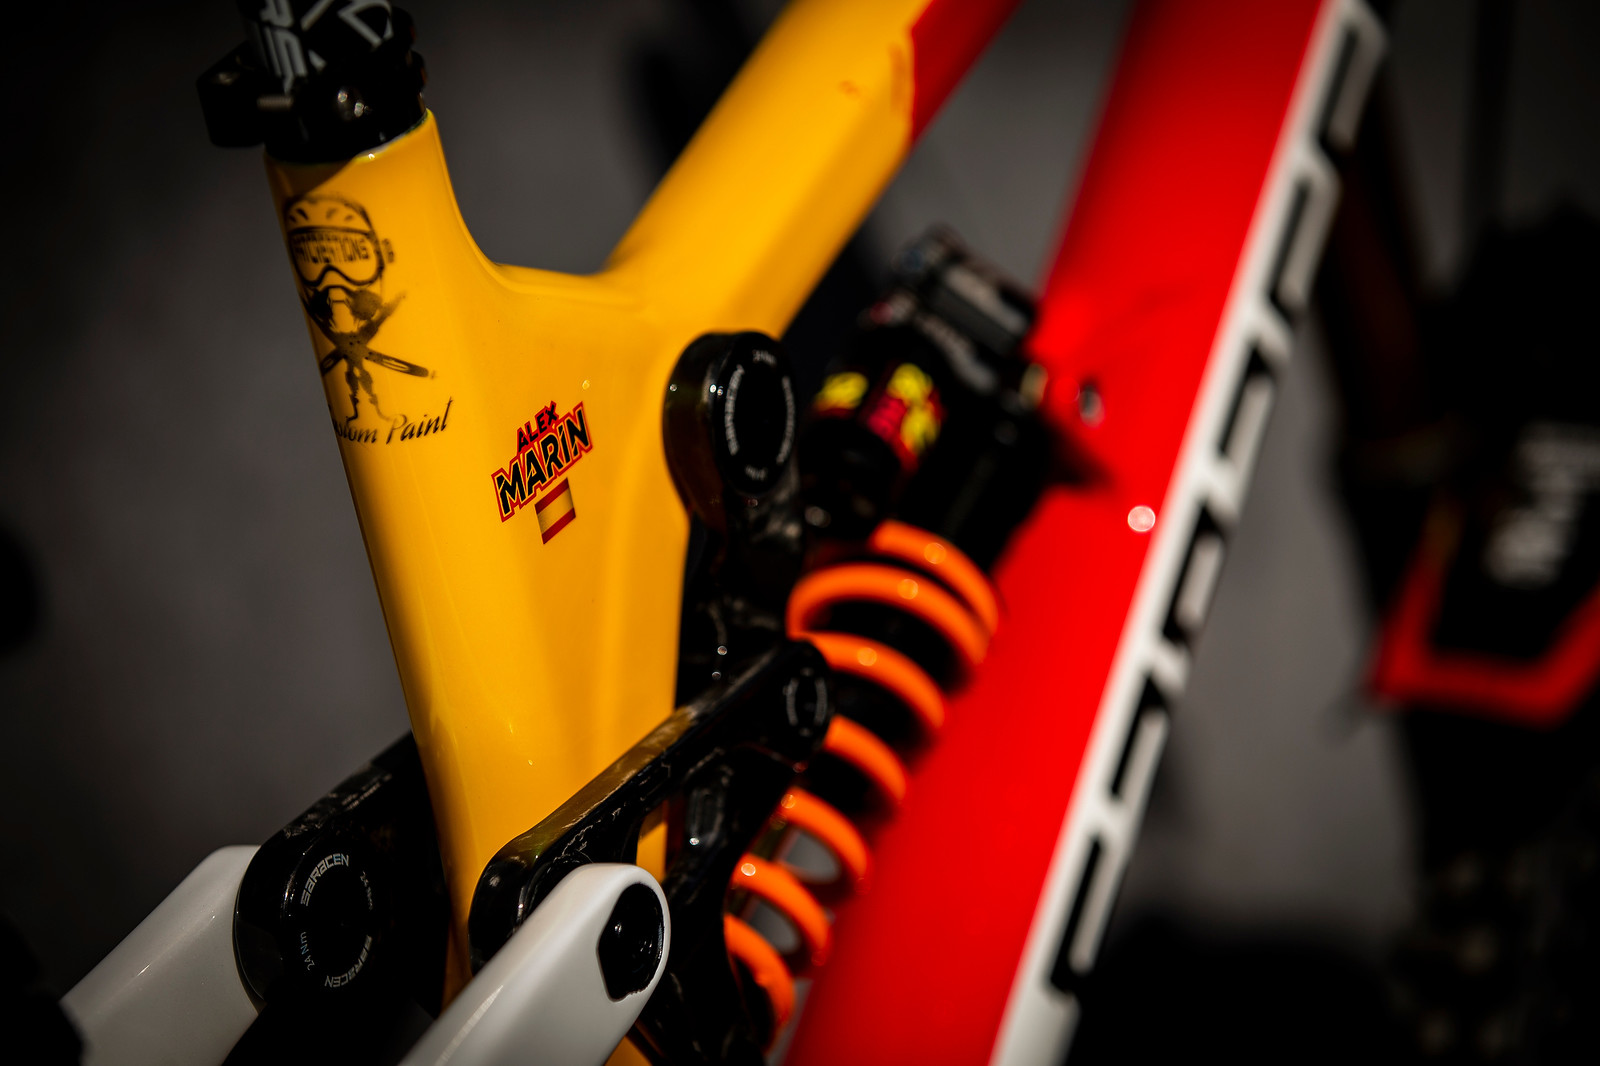 Sunny Goodness - WORLD CHAMPS BIKE - Alex Marin's Saracen Myst - Mountain Biking Pictures - Vital MTB